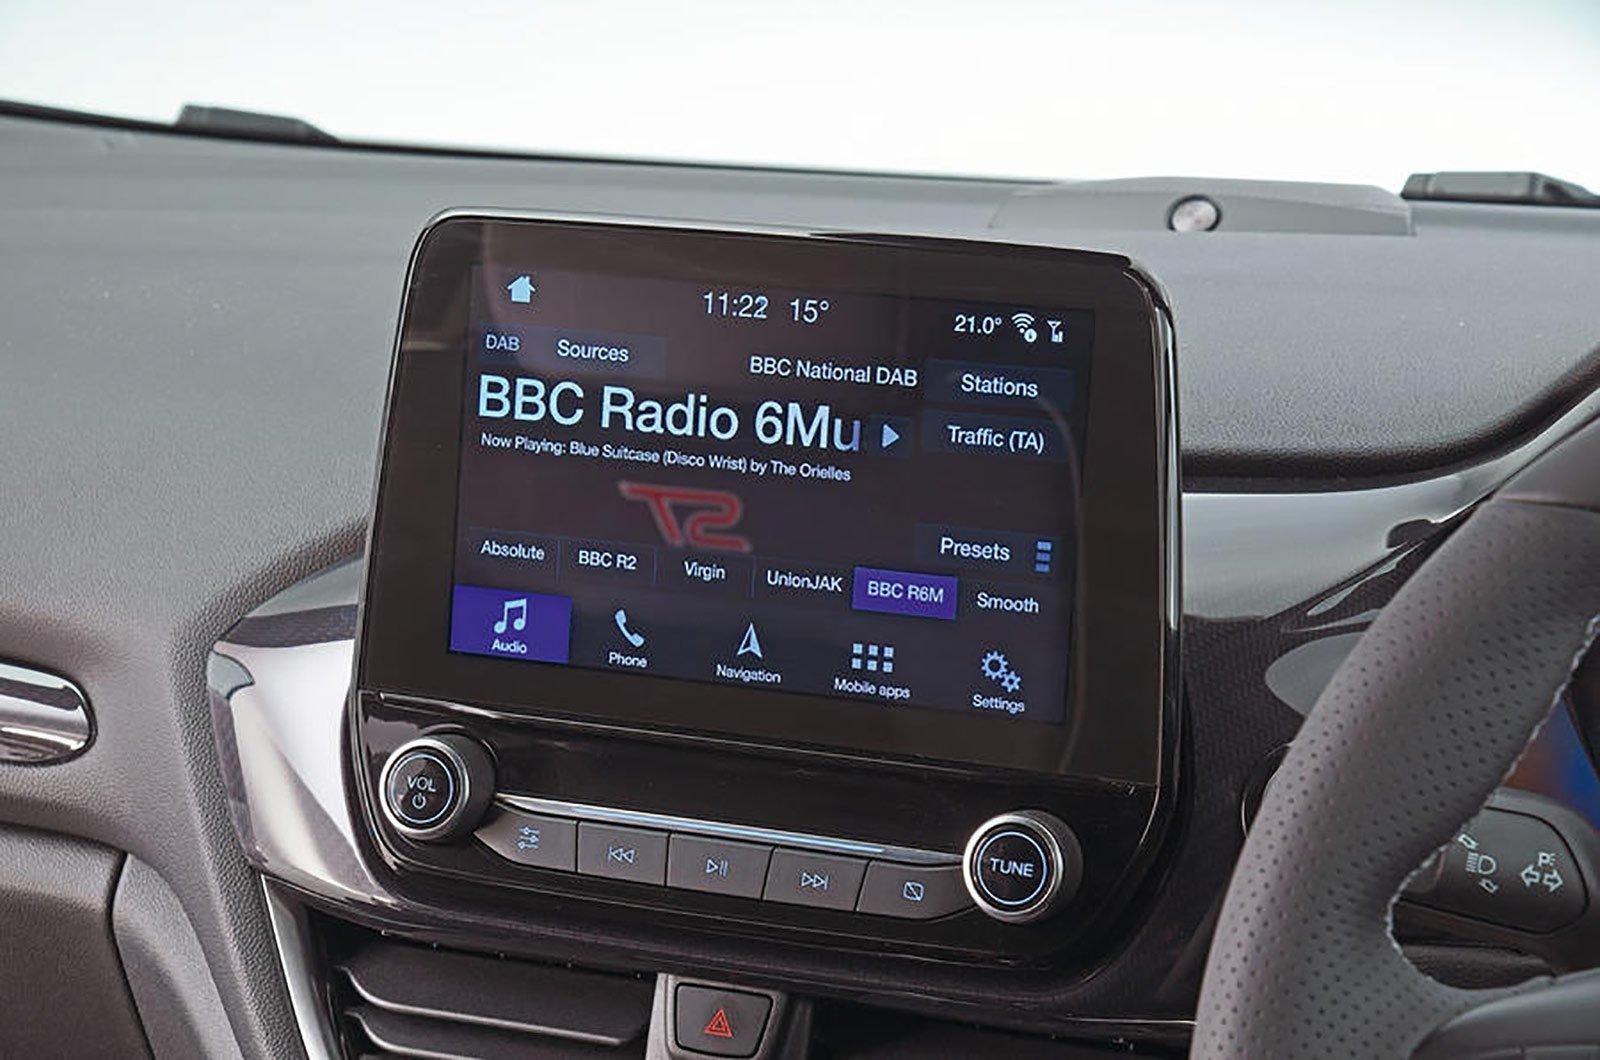 Ford Fiesta ST infotainment system